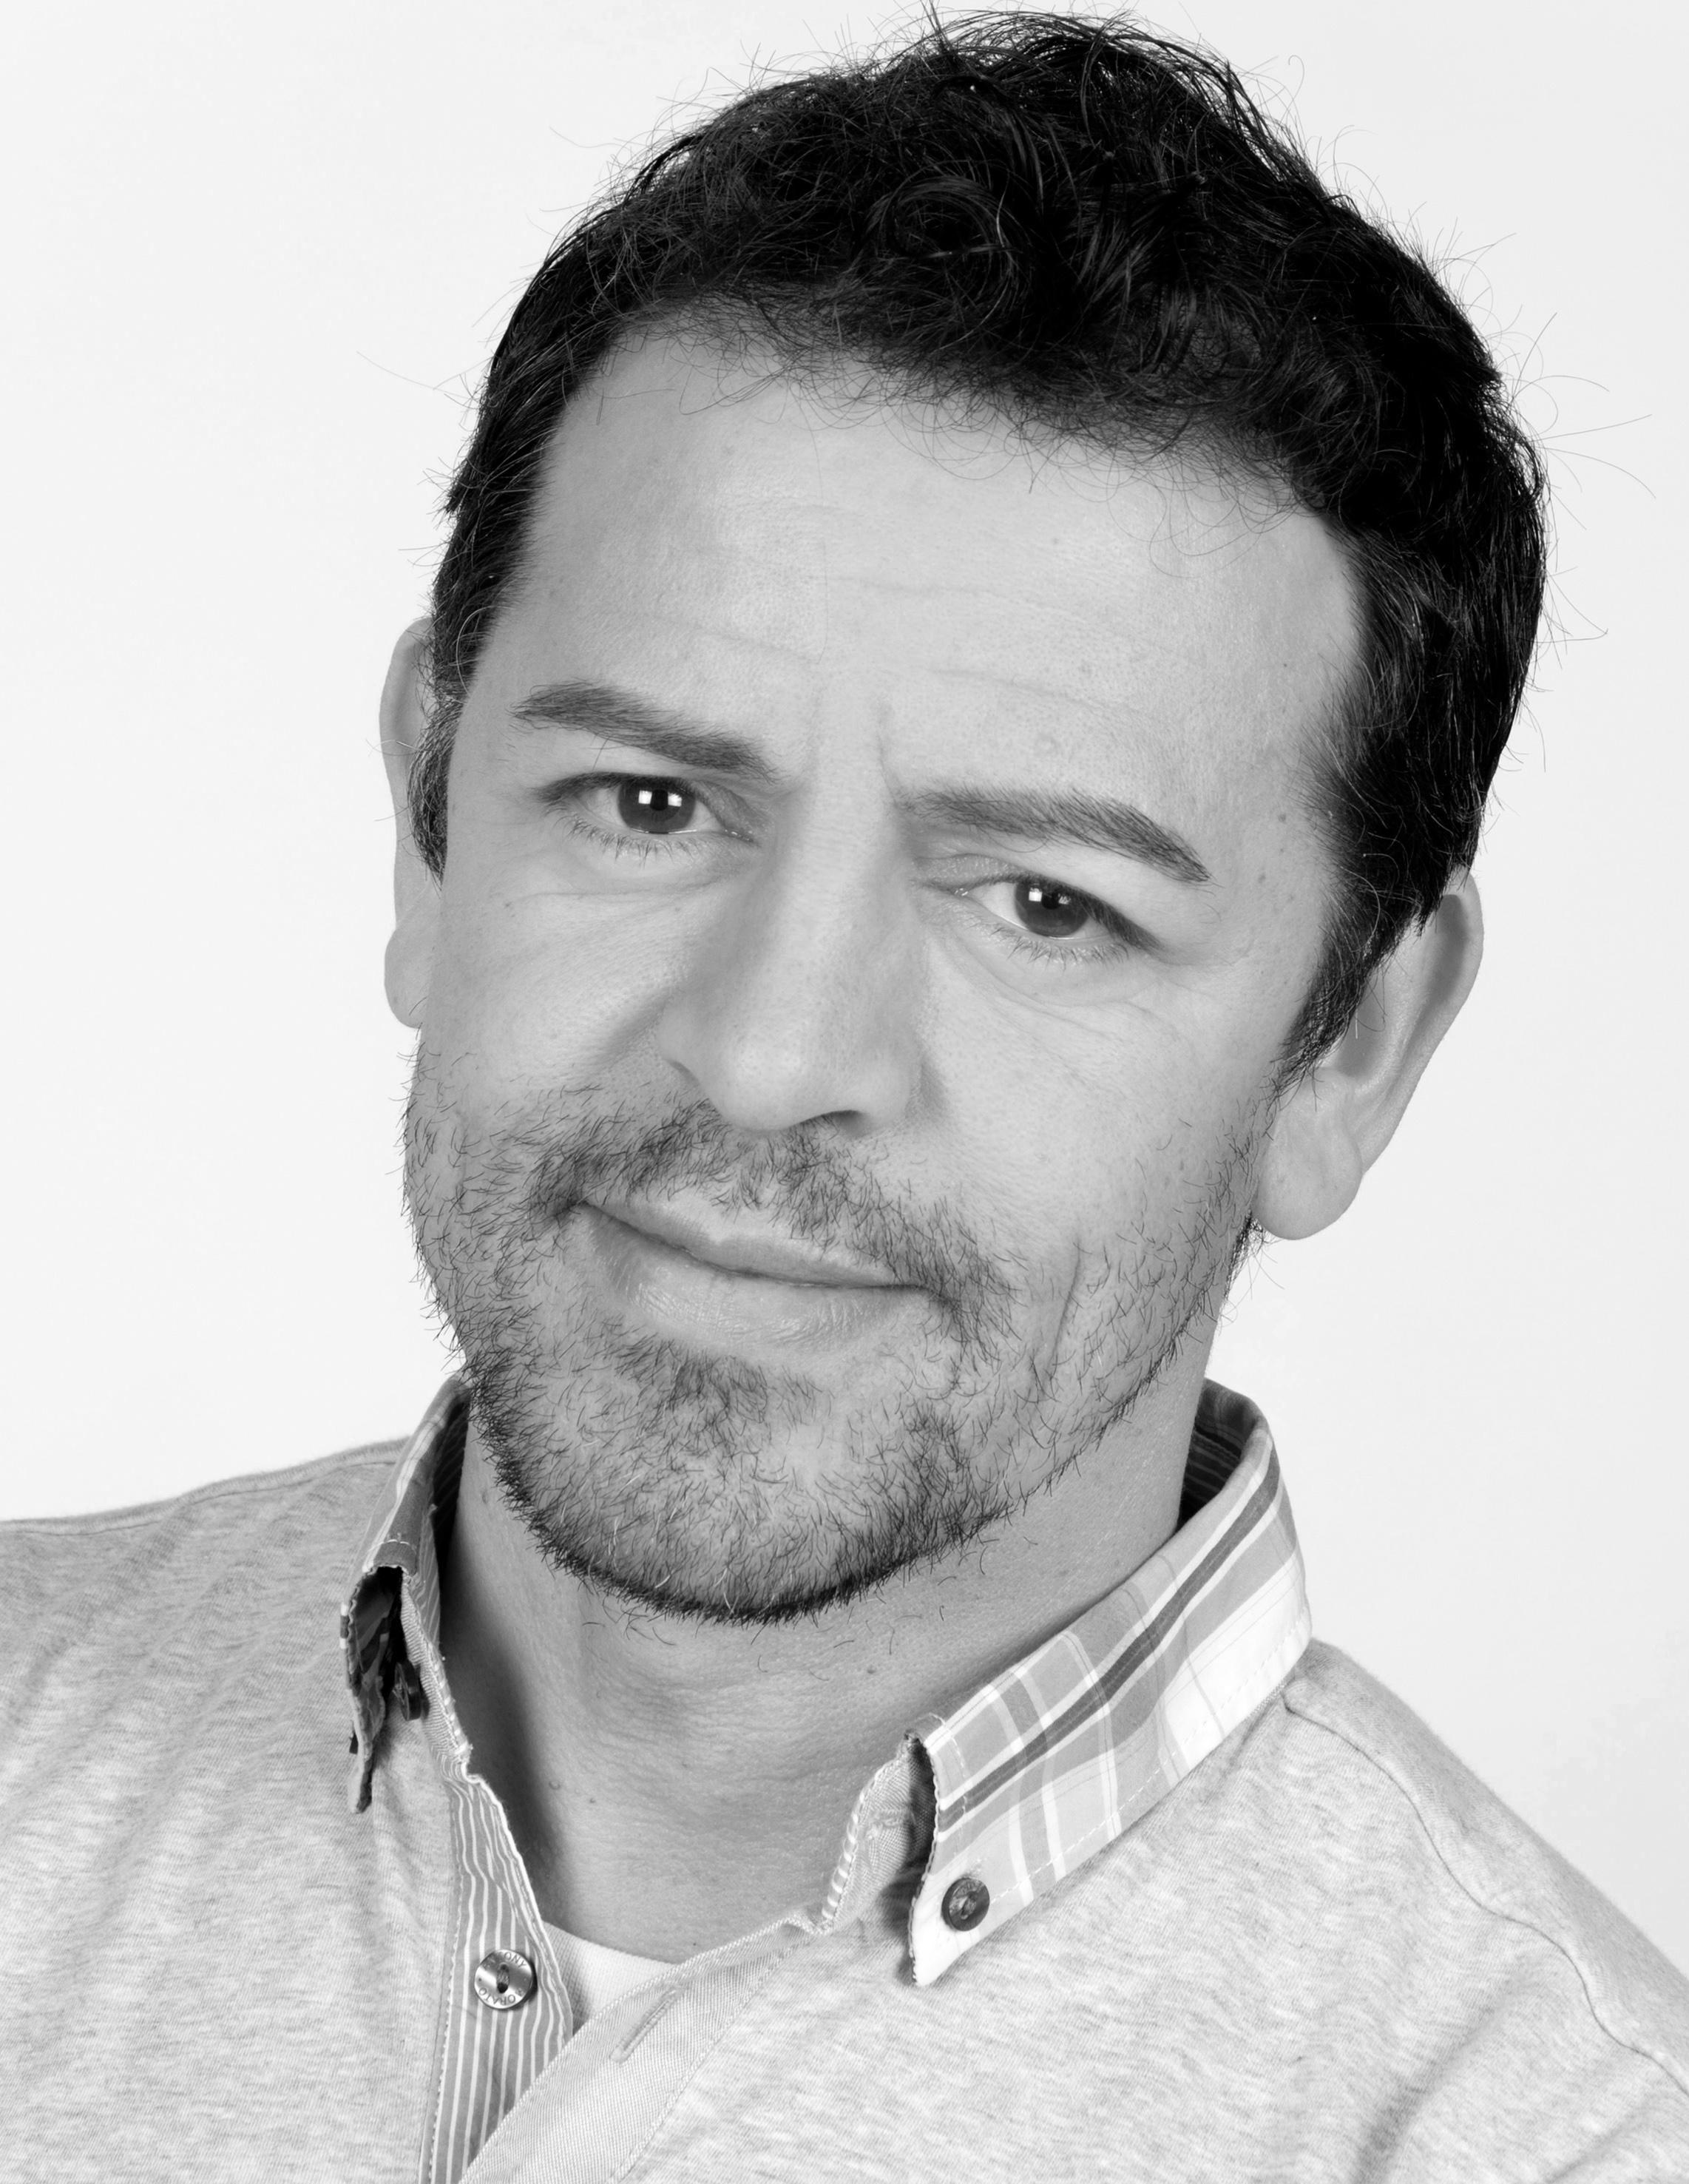 Jose Losada